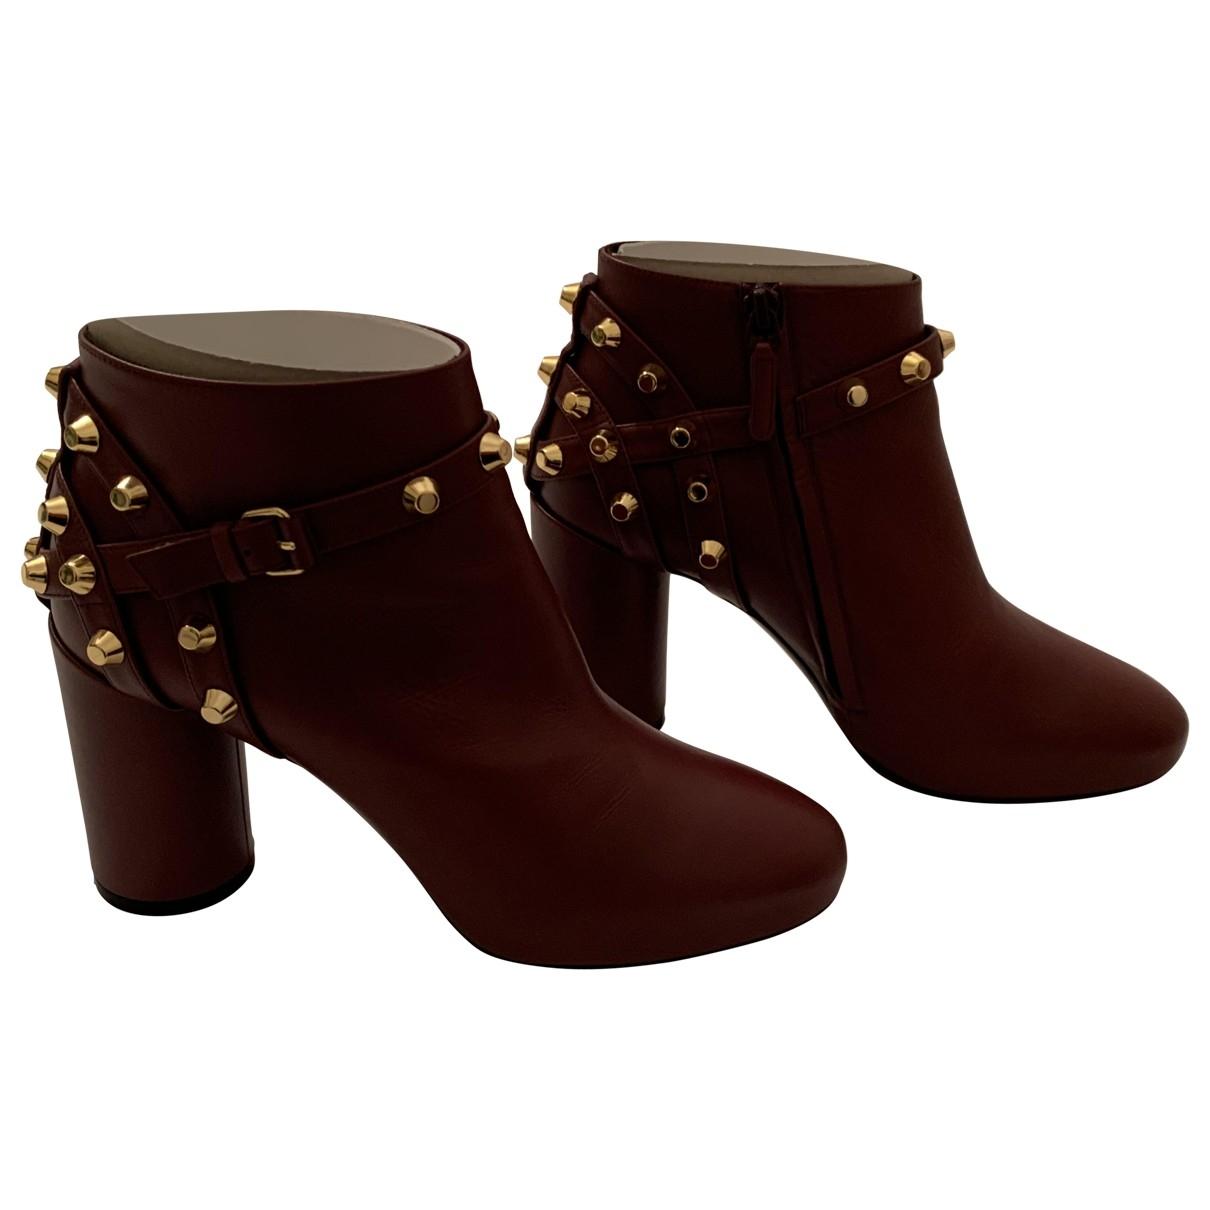 Balenciaga \N Burgundy Leather Ankle boots for Women 37.5 EU